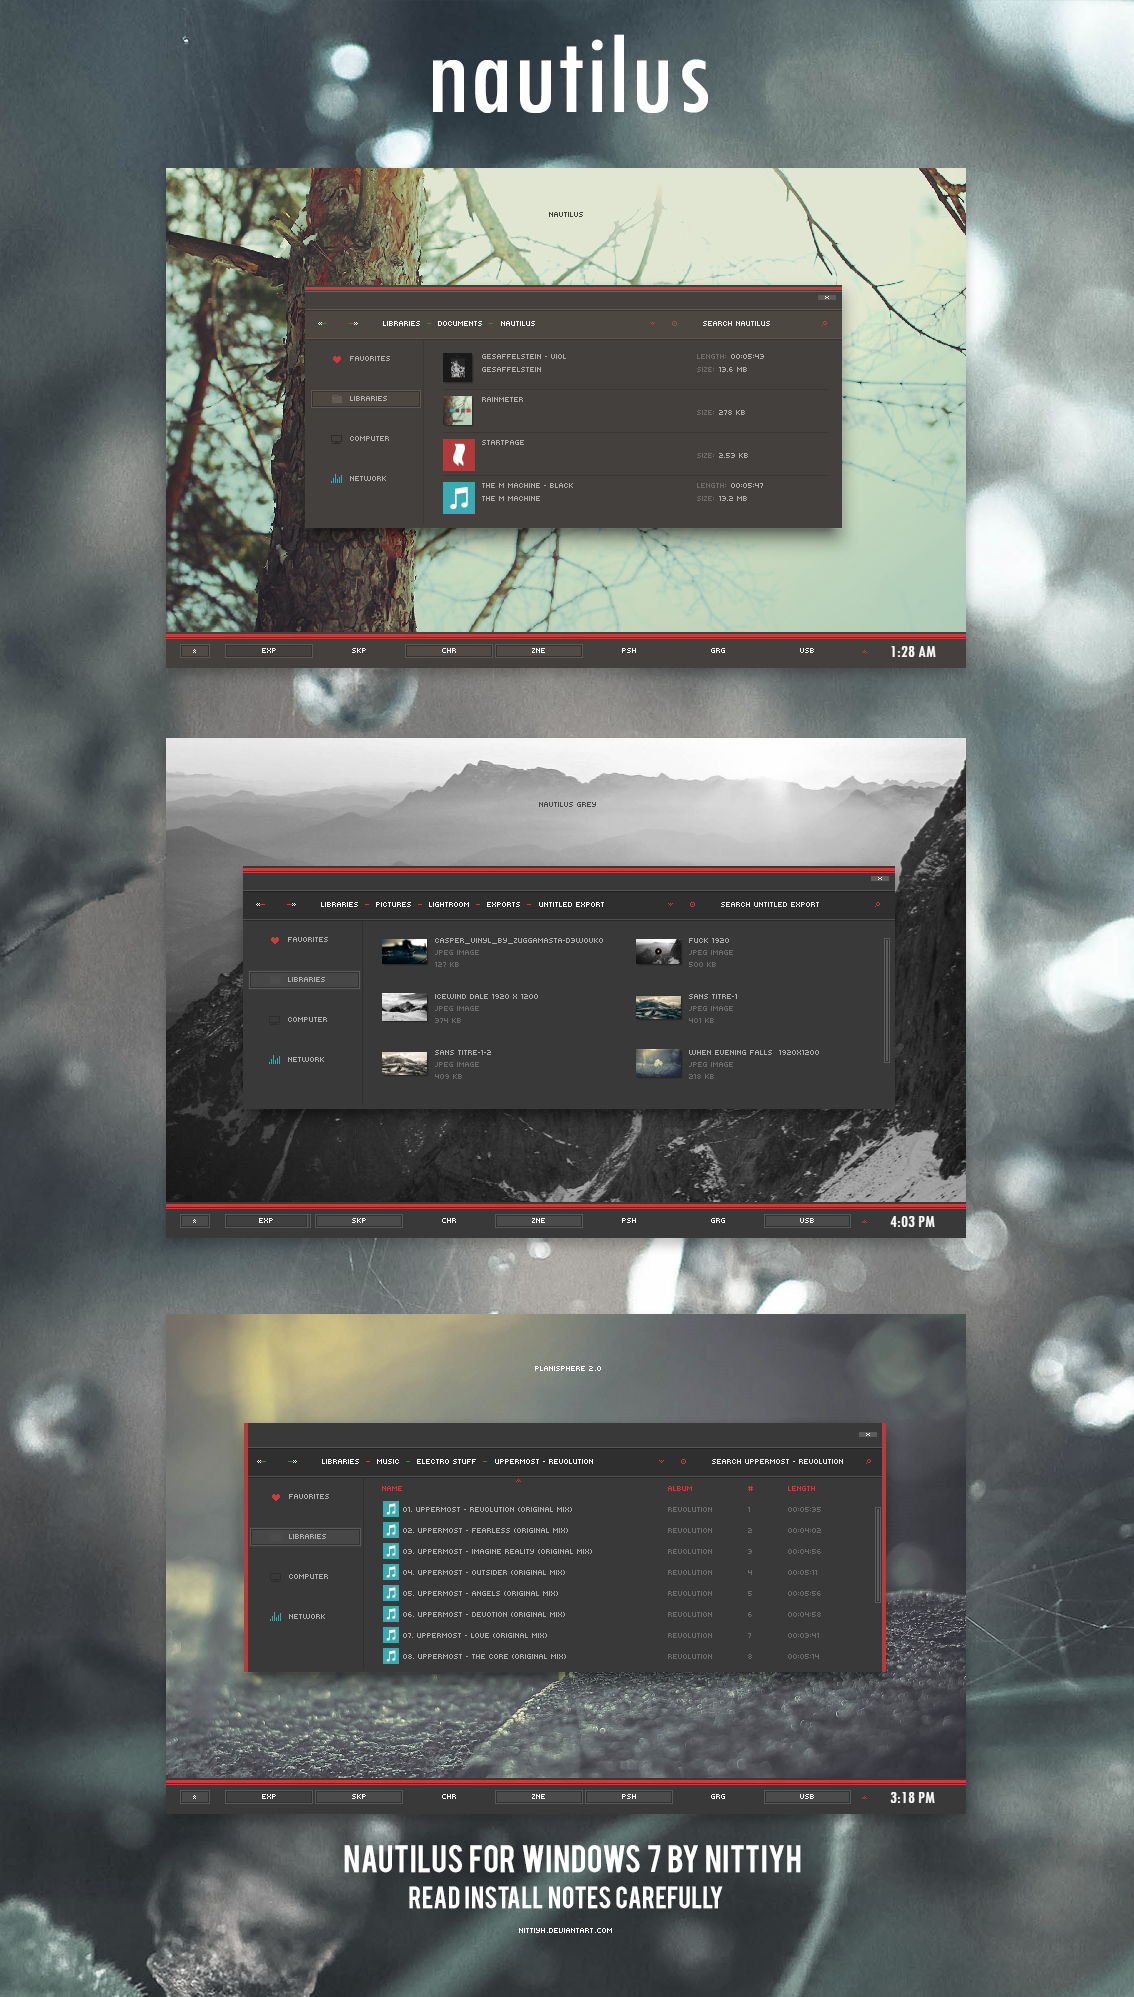 Nautilus for Windows 7 by Nittiyh